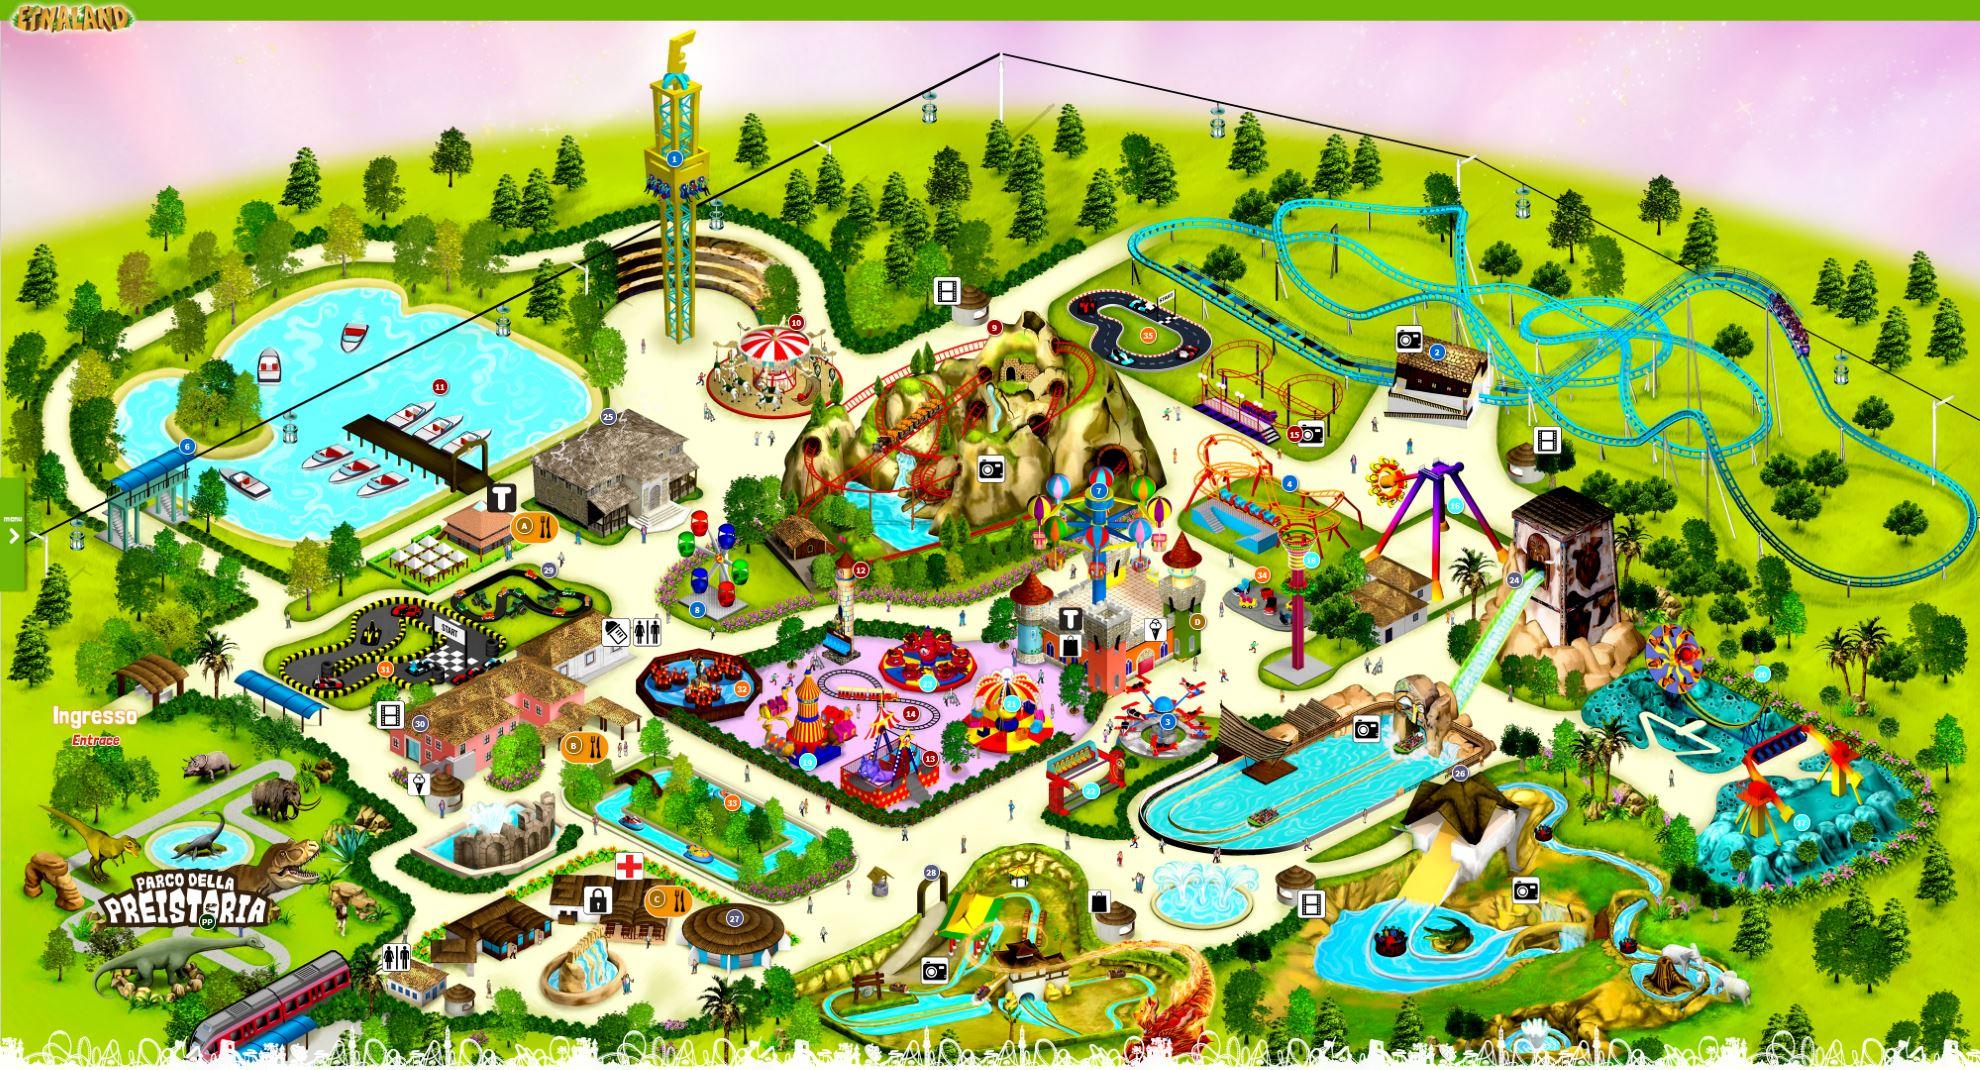 Calendario Etnaland.Etnaland Catania Themepark Ticket Prices 2019 Theme Park